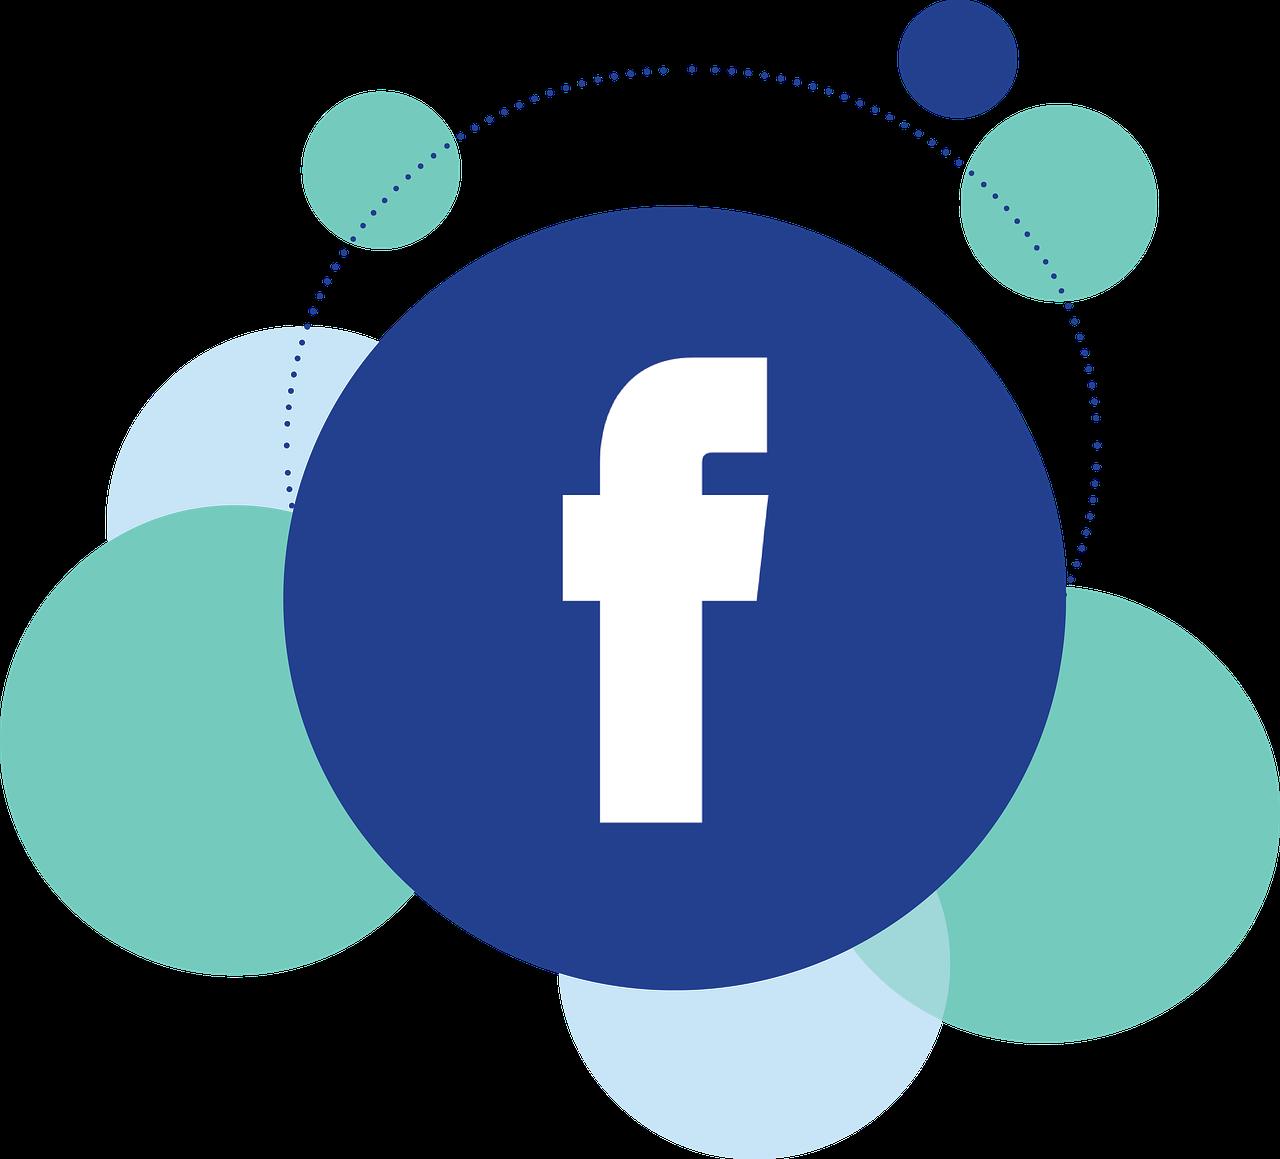 Facebook วางแผนรวม AR, VR และ News Feed ให้สามารถโพสต์รูปภาพเคลื่อนไหวแบบ 3D ได้